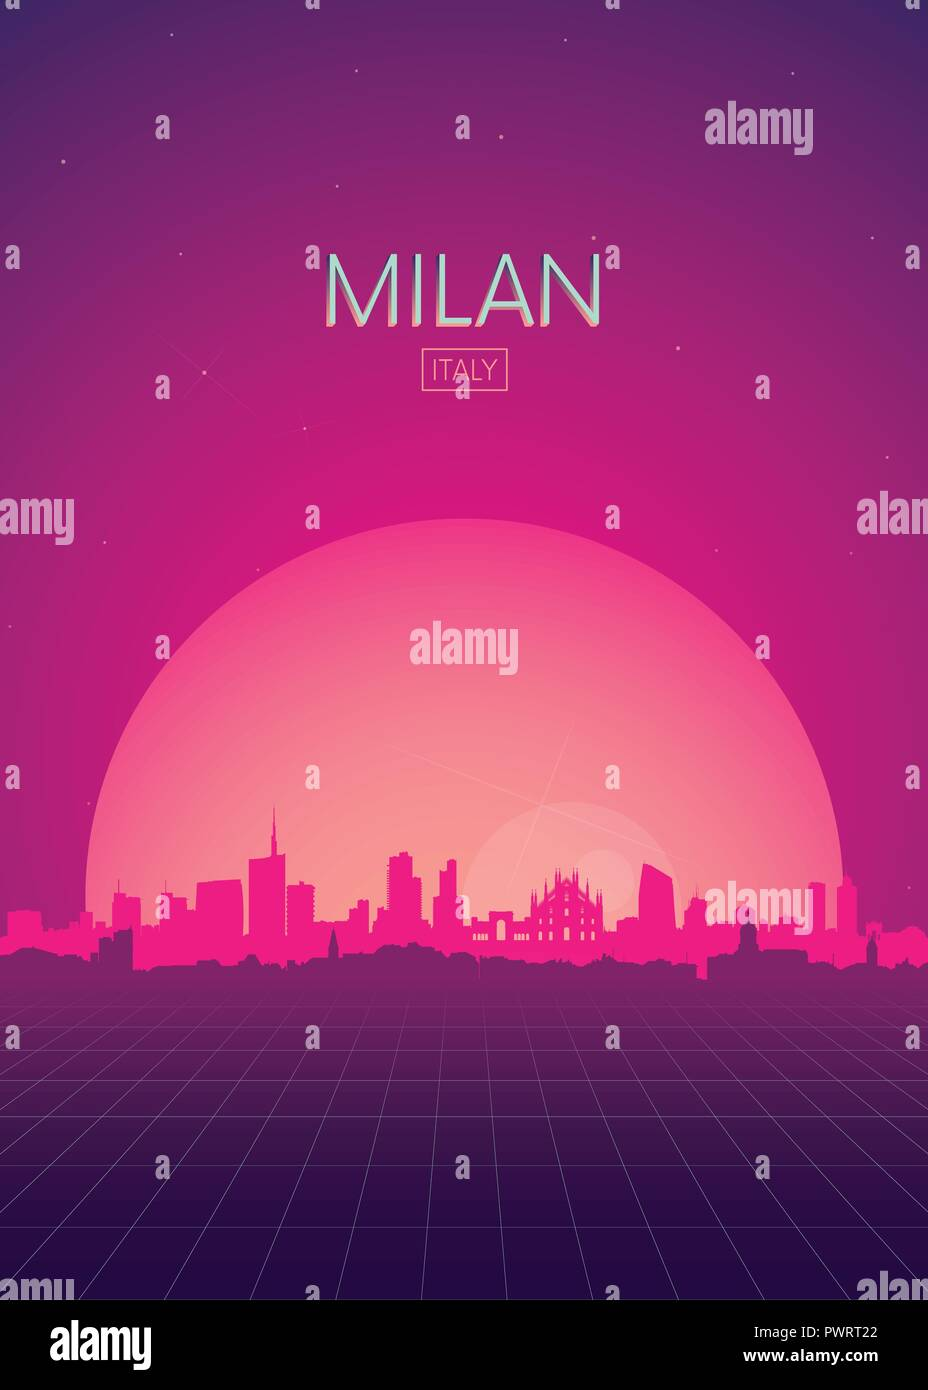 Travel poster vectors illustrations, Futuristic retro skyline Milan template for your design - Stock Vector